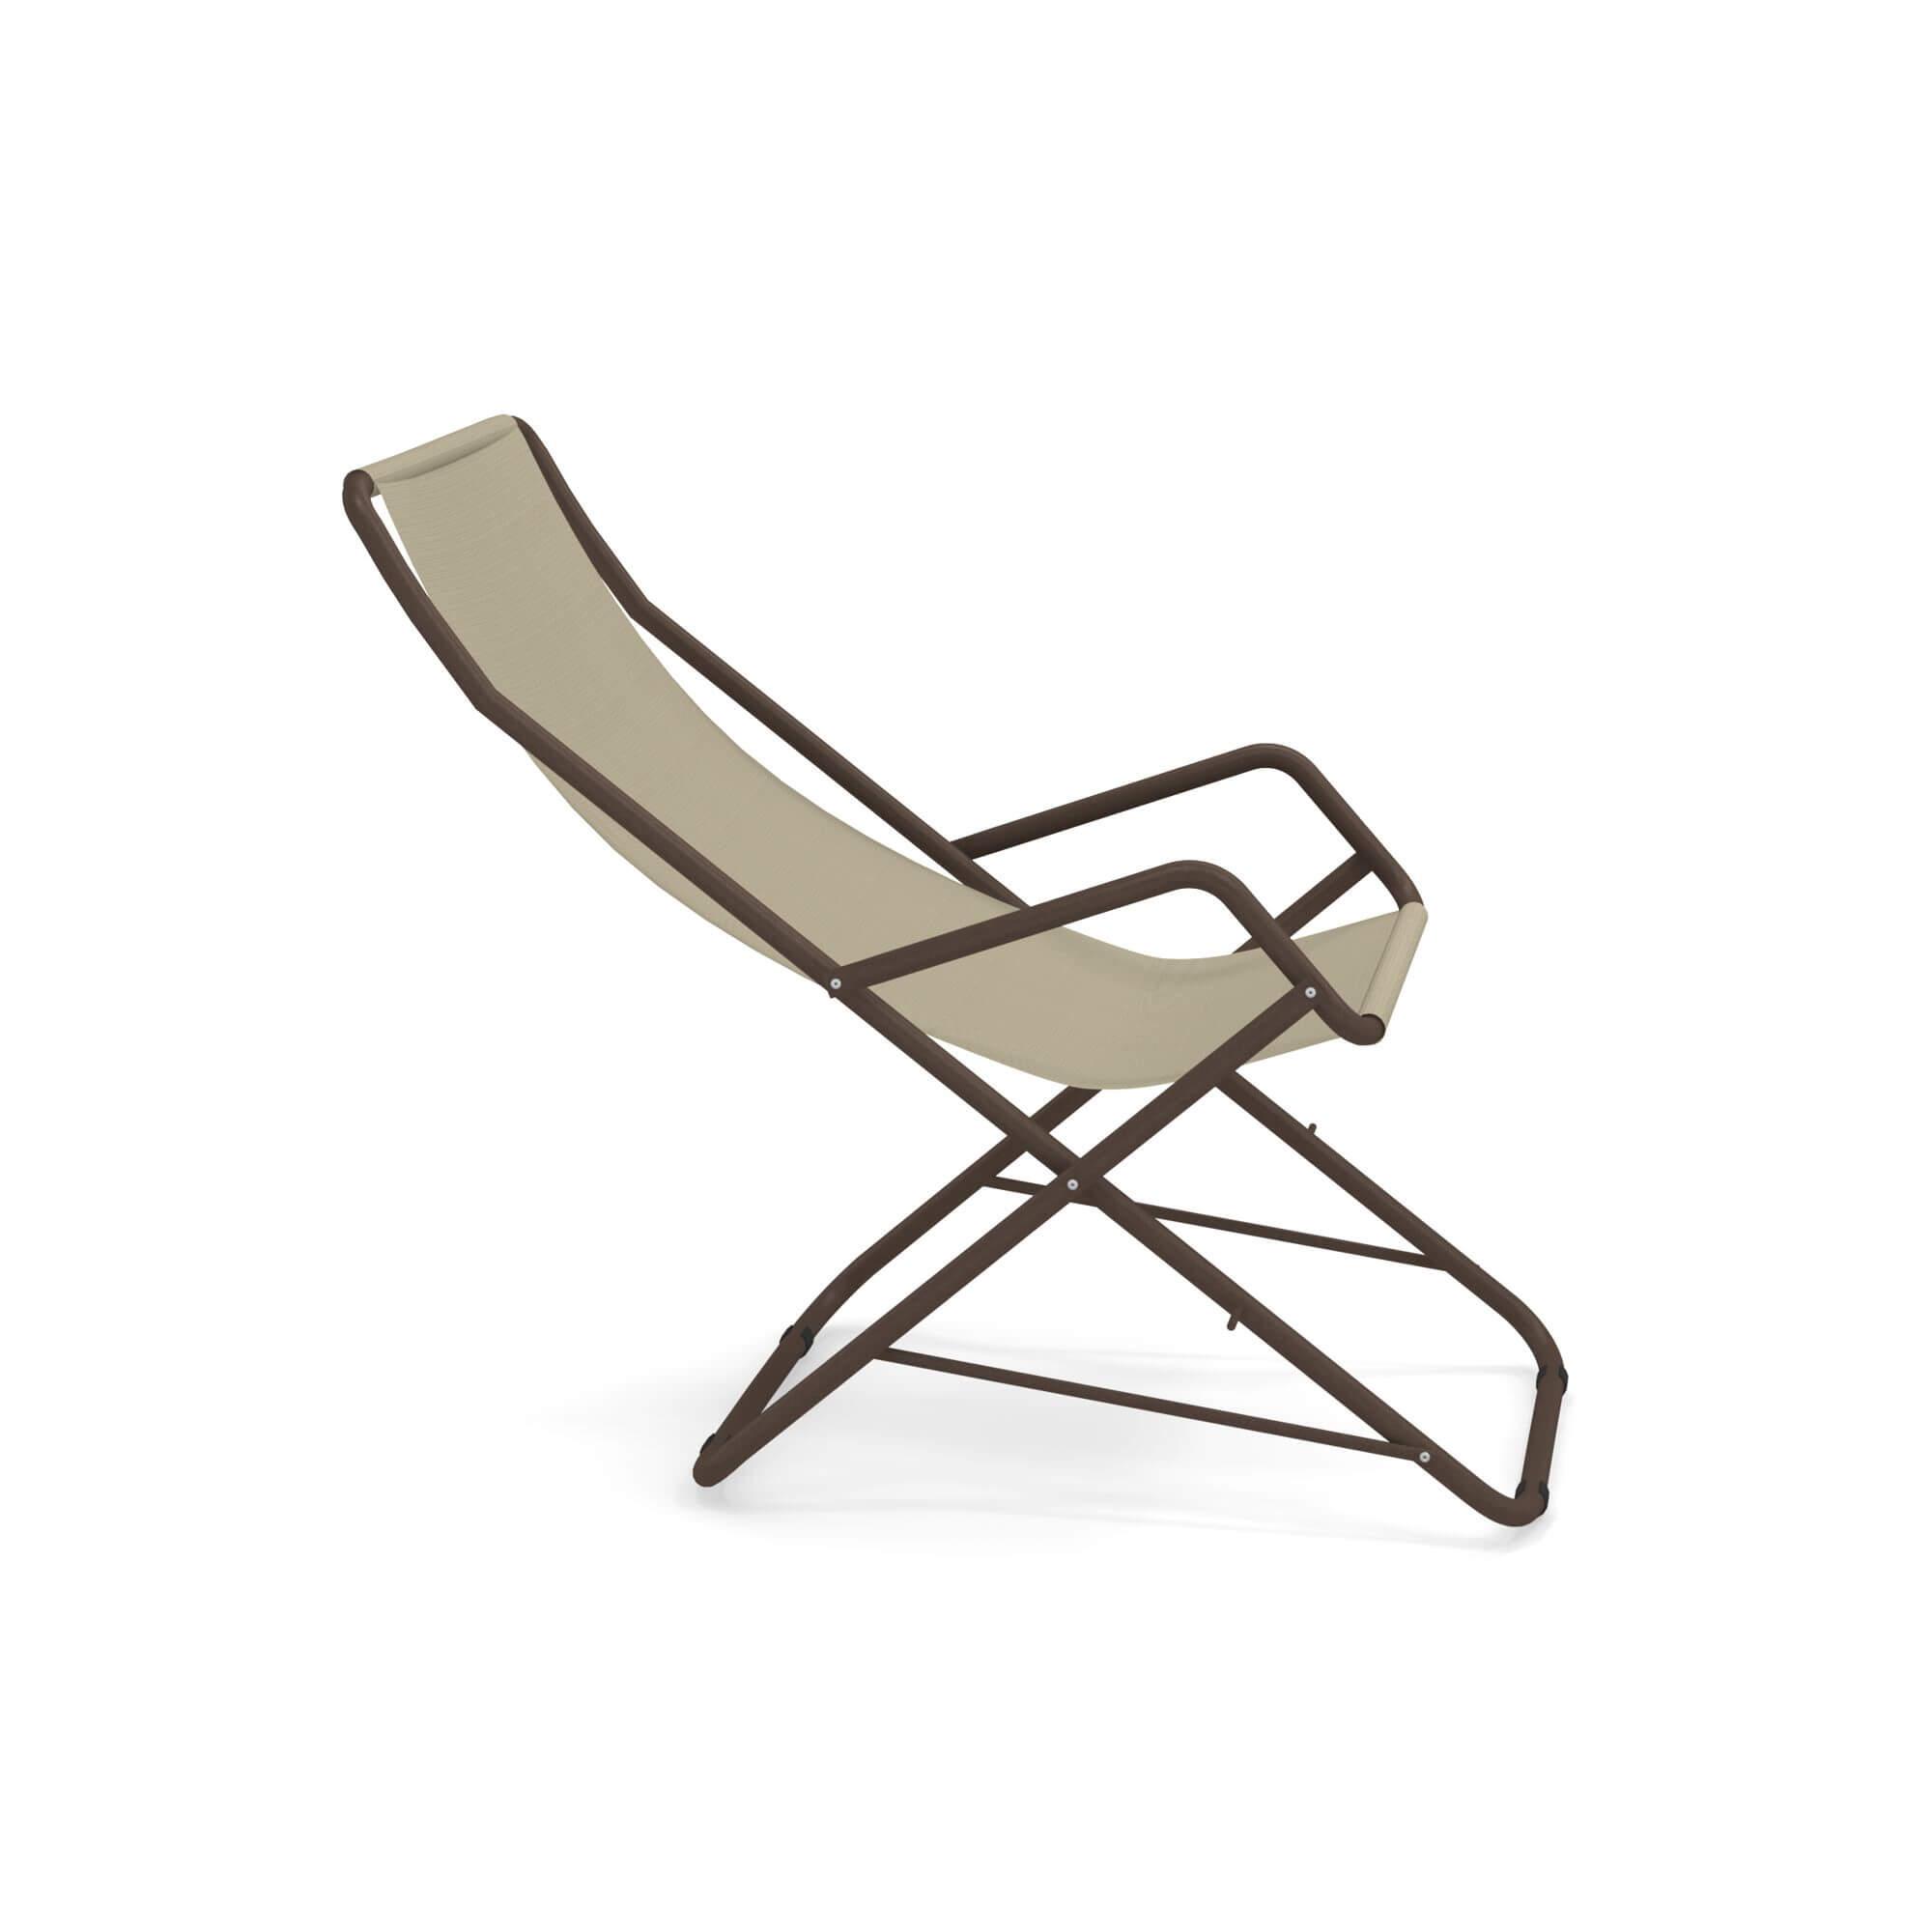 Sdraio Bahama Emu Prezzo.Garden Deck Chair Outside In Steel Emu Tex Collection Bahama